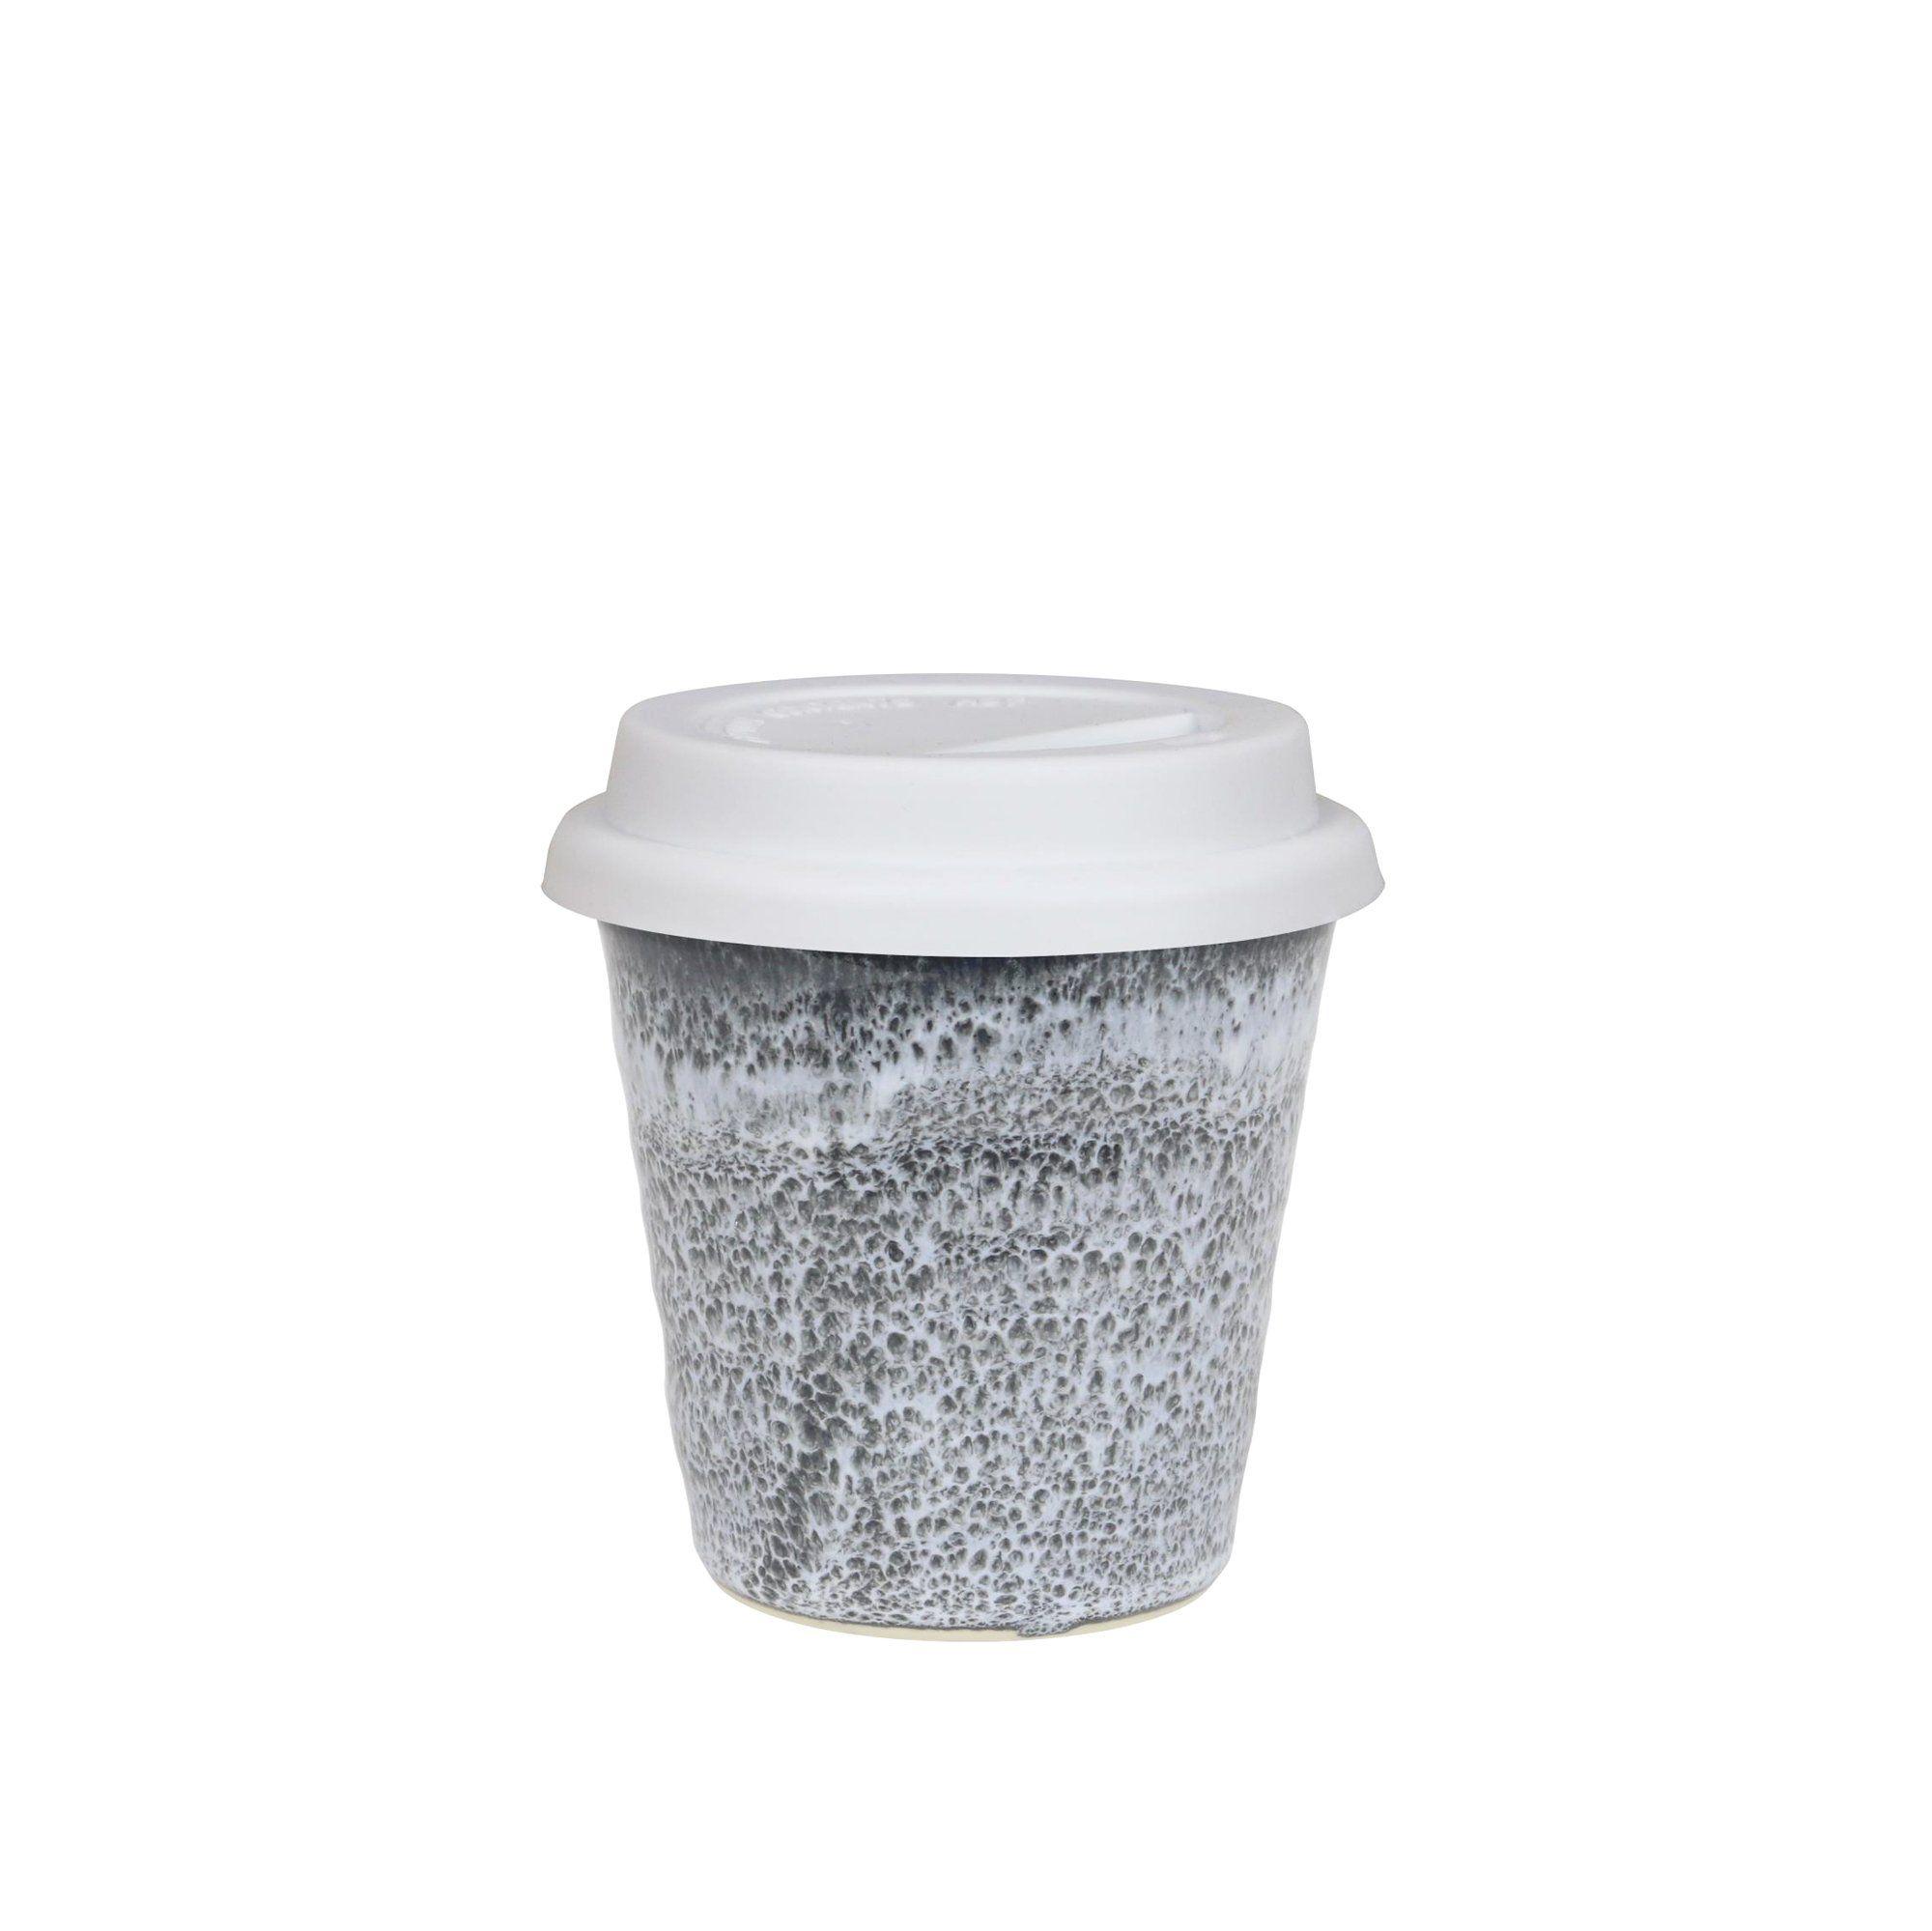 3a503524f03 $40 Carousel Ceramic Coffee Cup - Storm - Robert Gordon - NZ Stockist -  Paper Plane